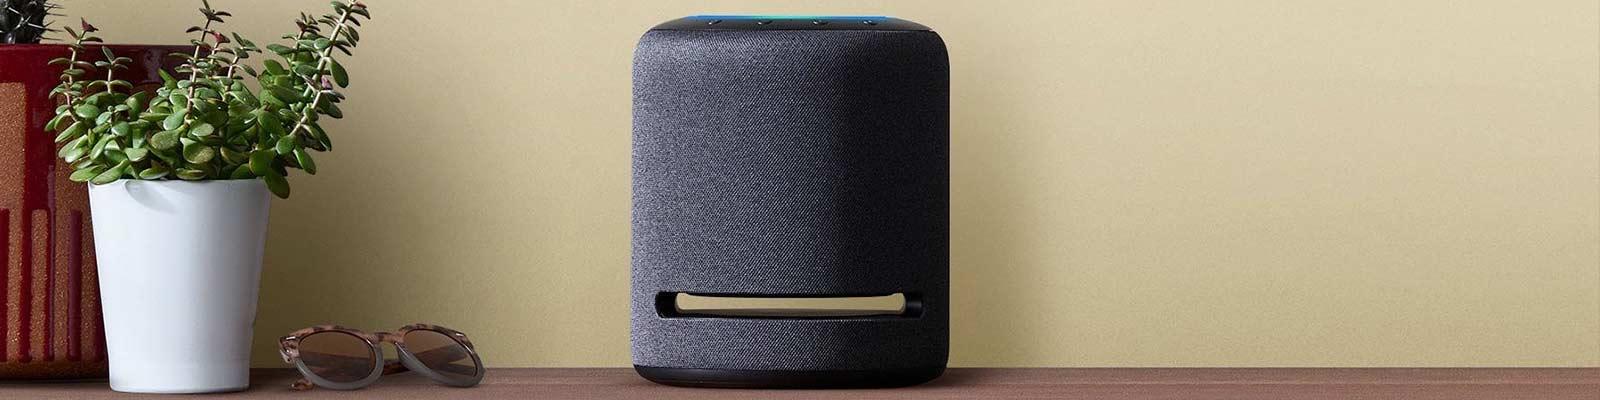 Amazon Alexa Gadgets